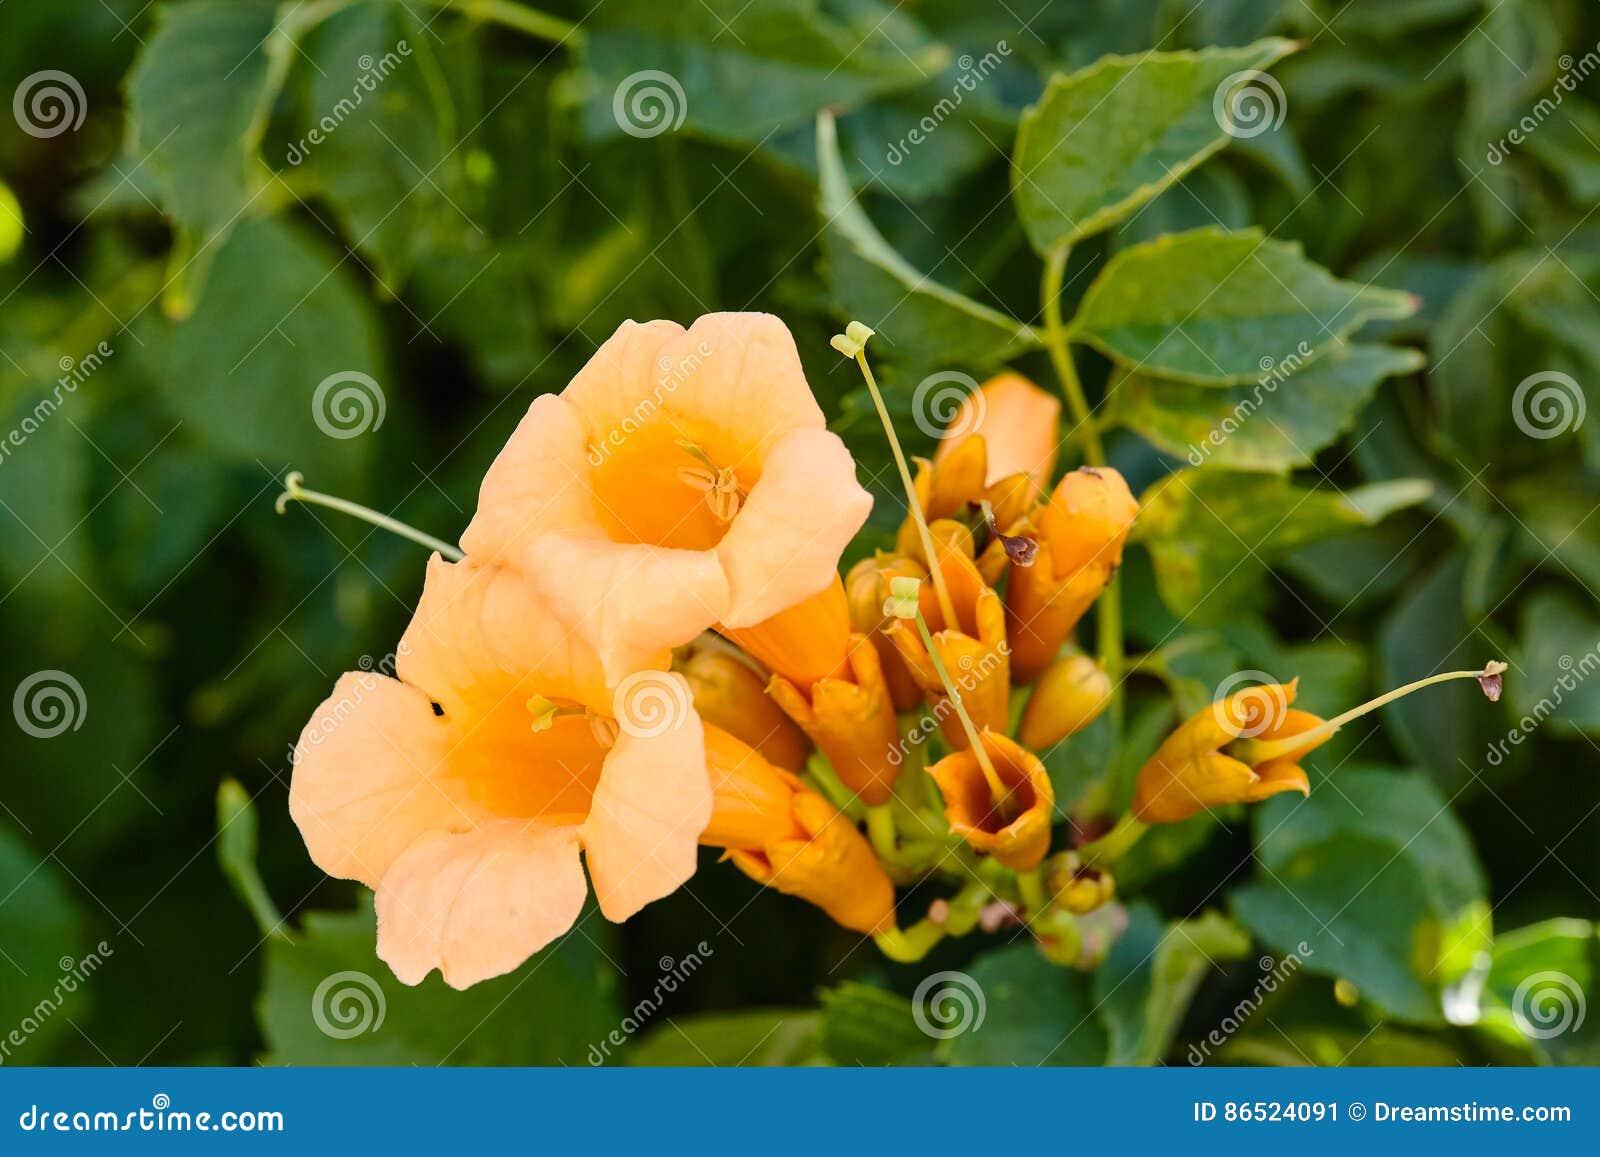 Yellow Flowering Campsis Radicans Or Trumpet Vine Spain Stock